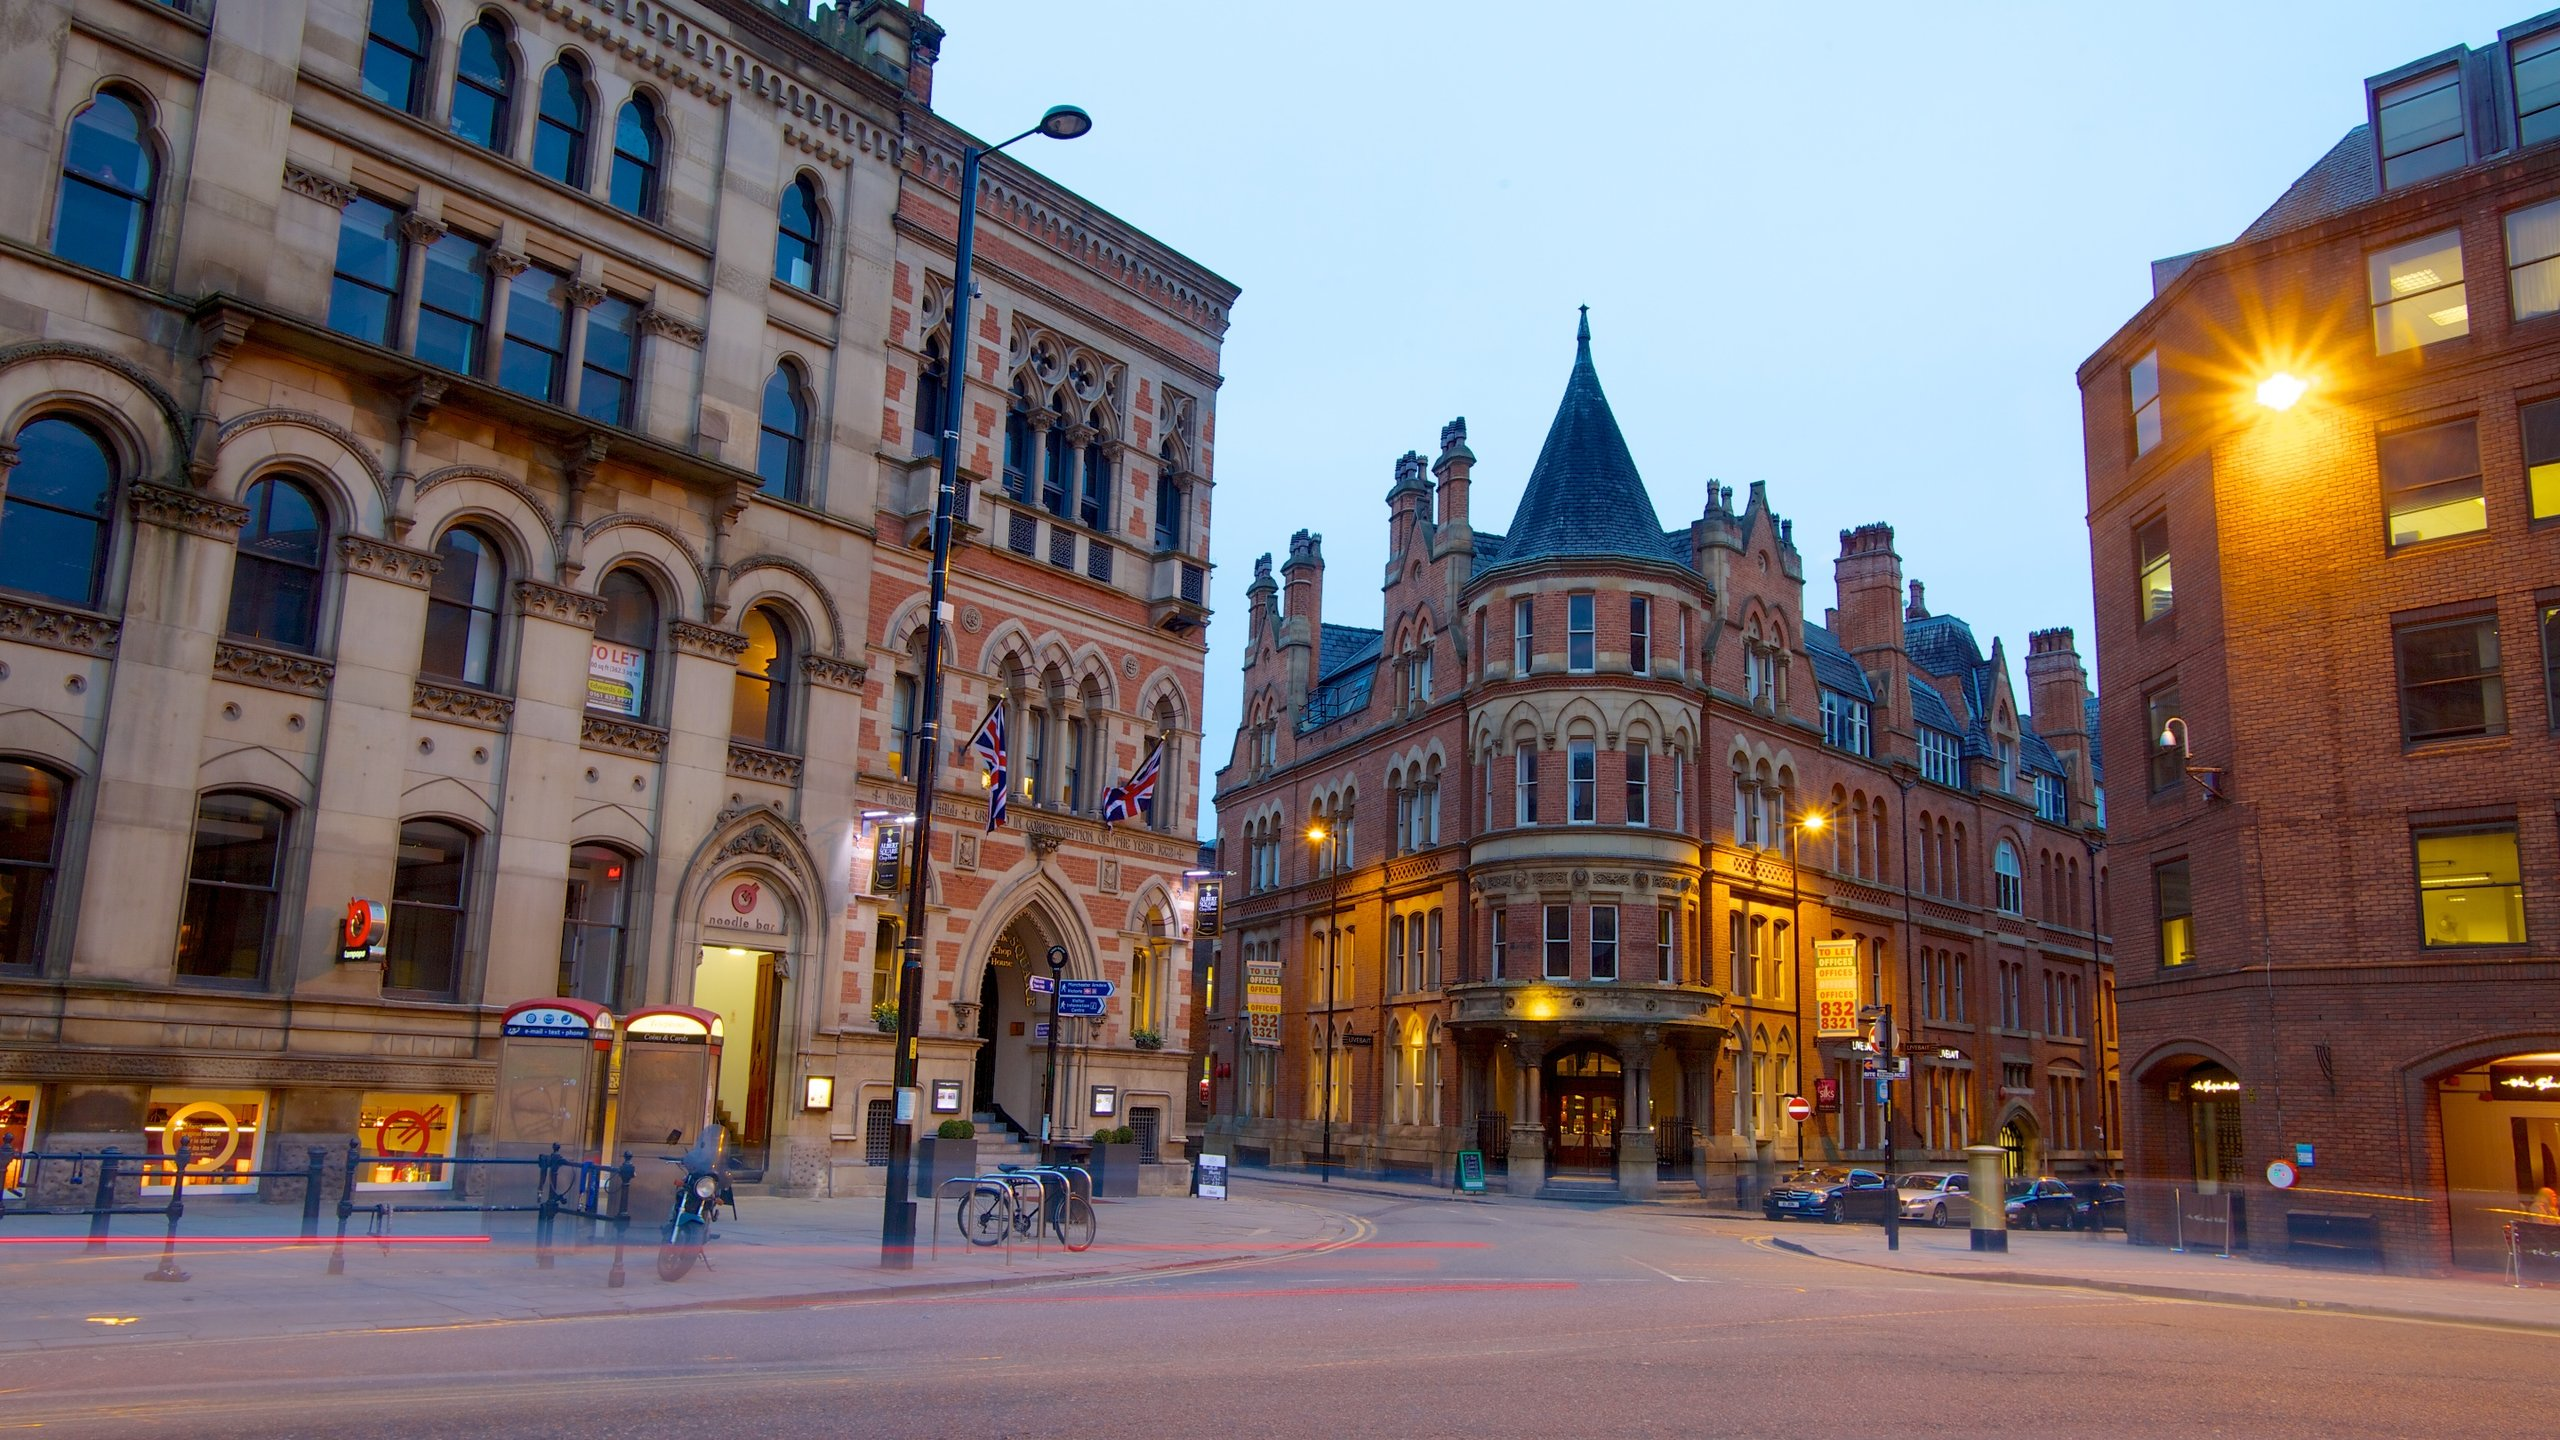 Manchester City Centre, Manchester, England, United Kingdom